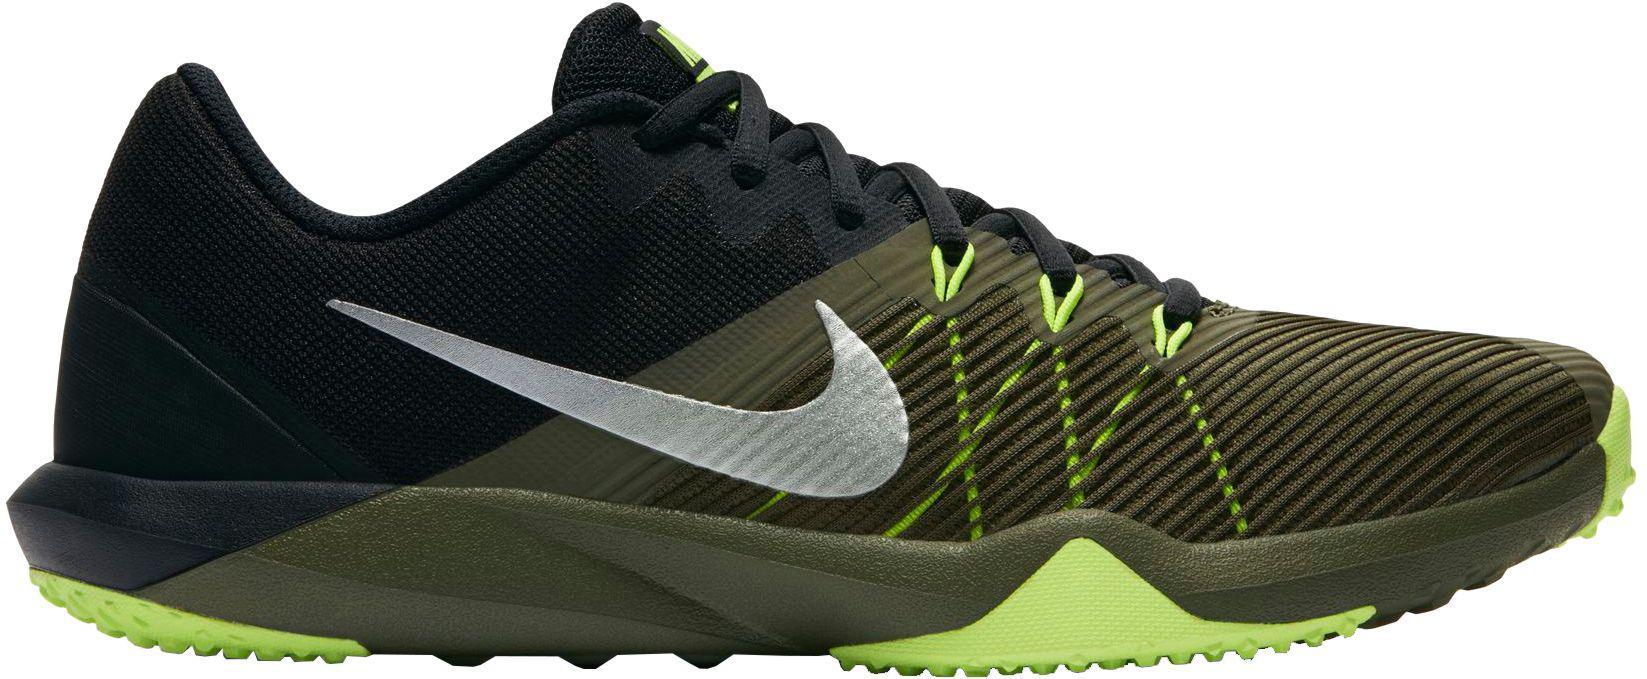 Nike. Men's Green Retaliation Tr Training Shoes